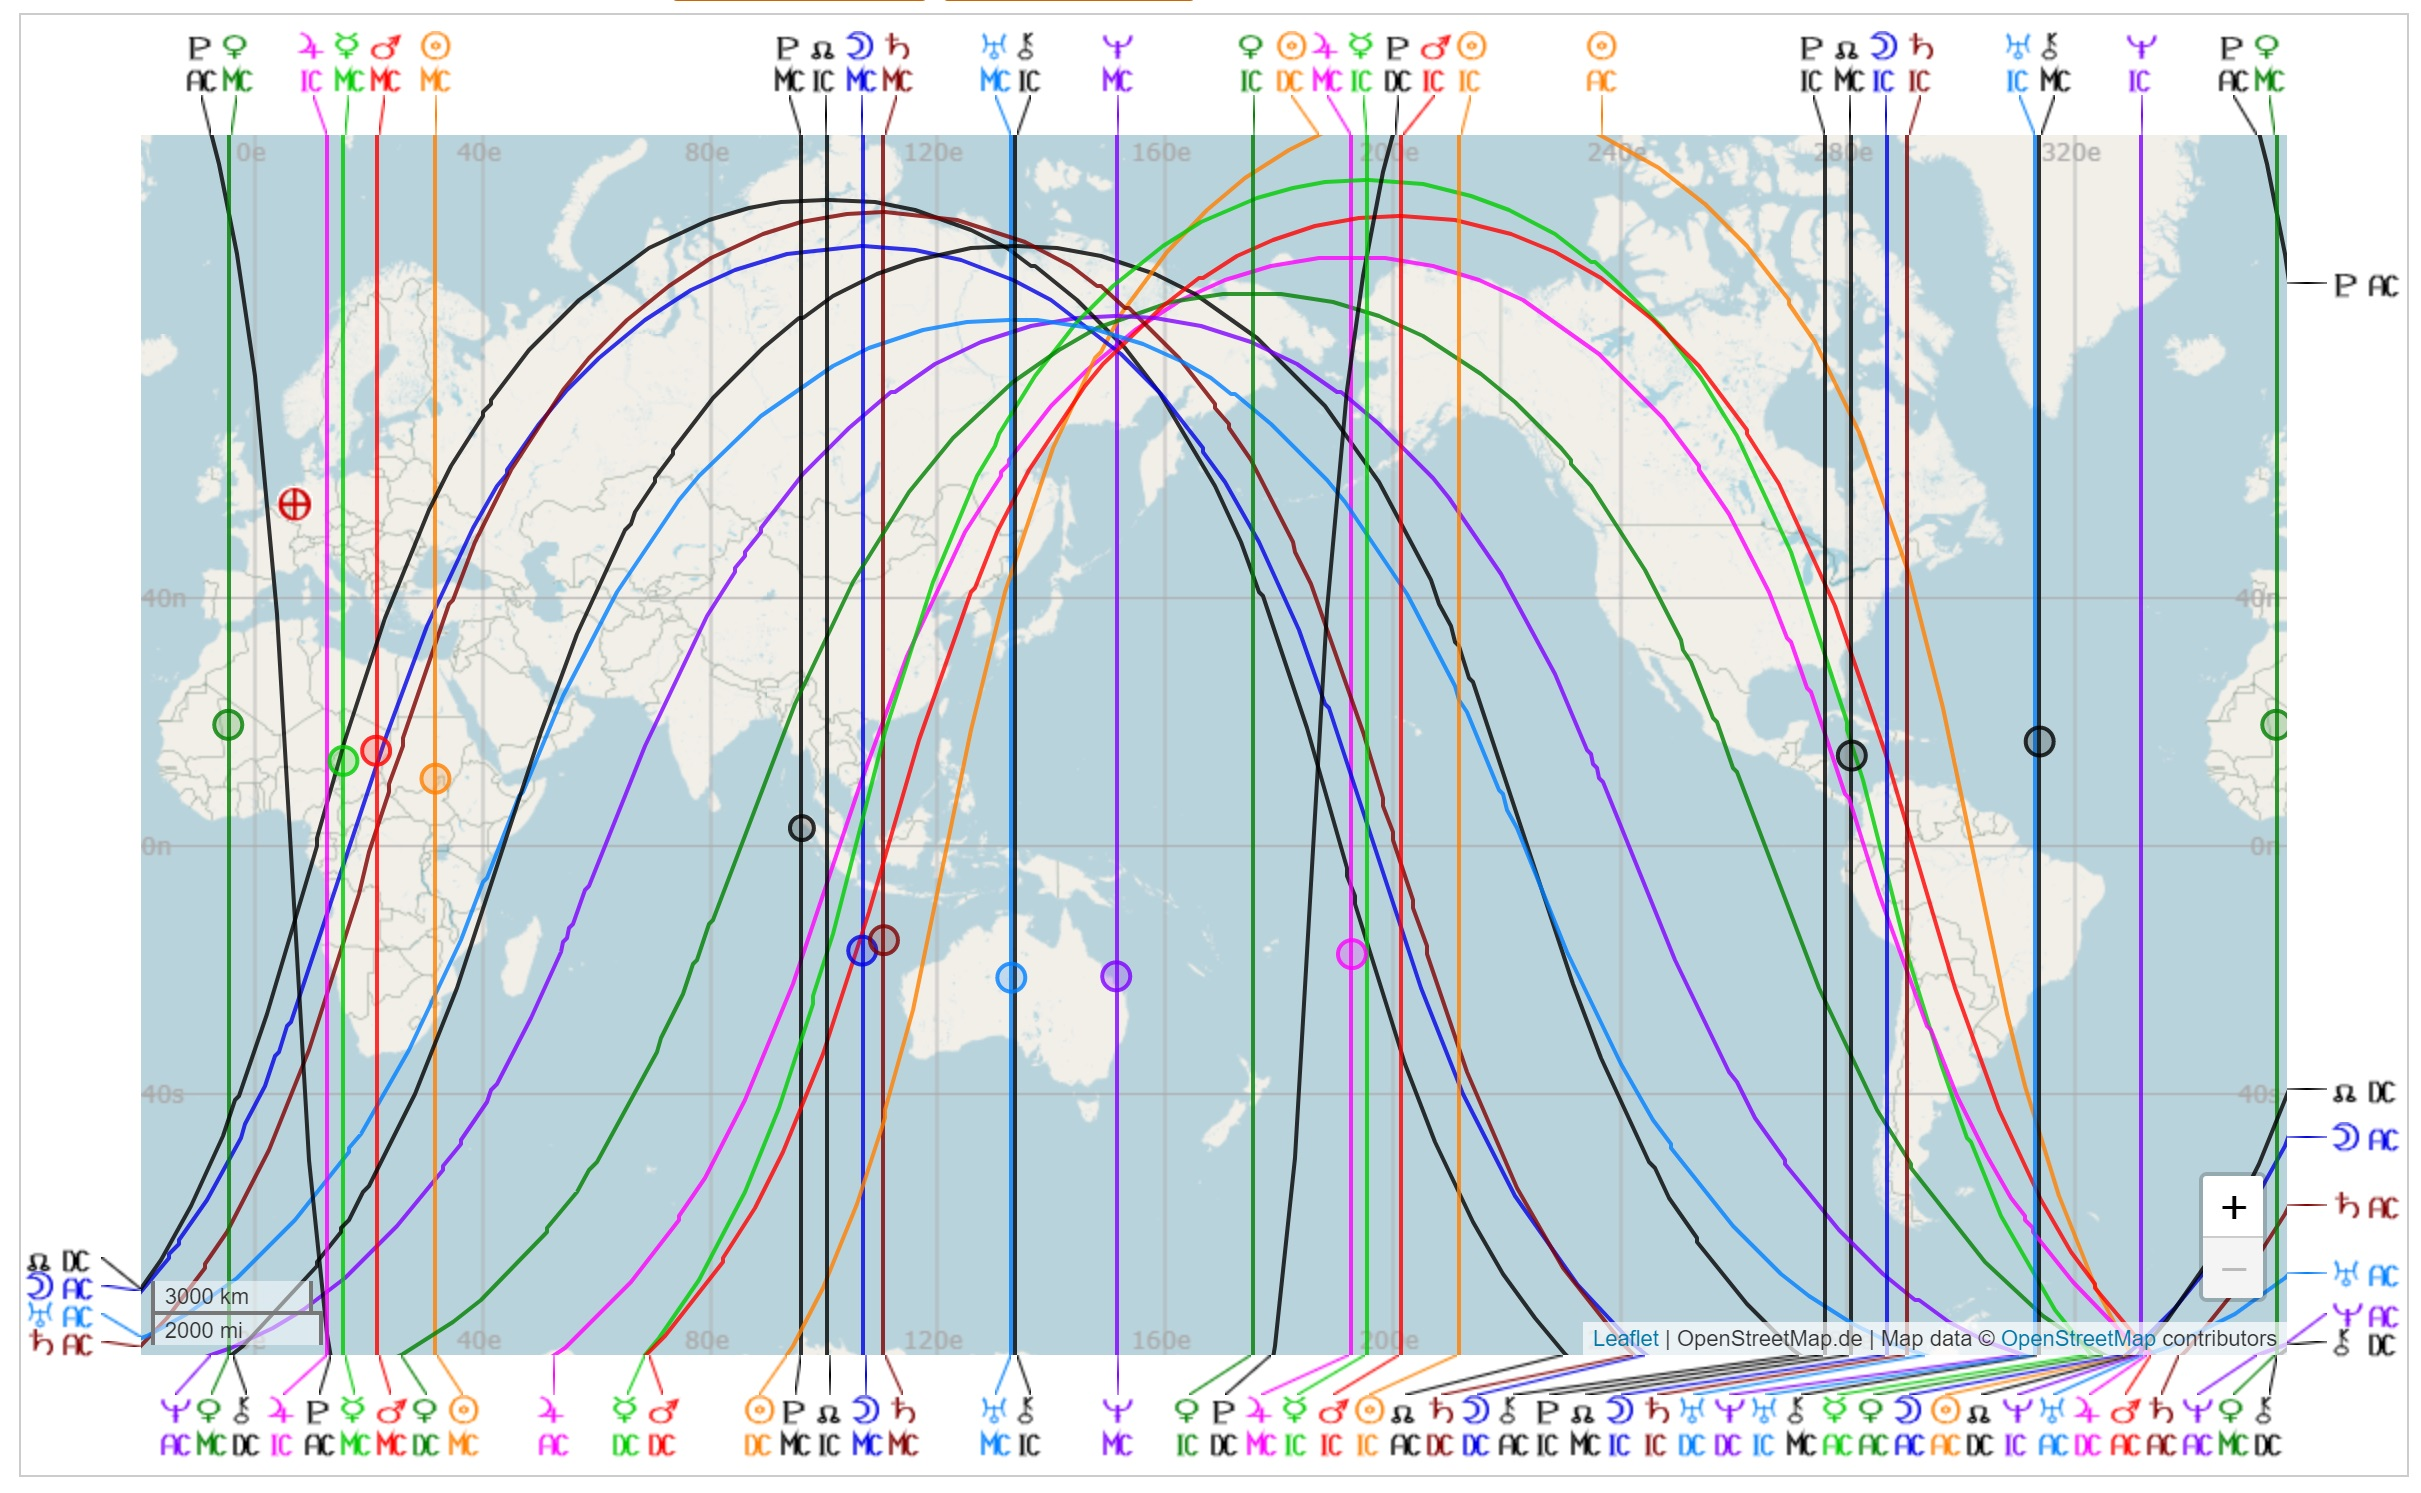 Astrogeography